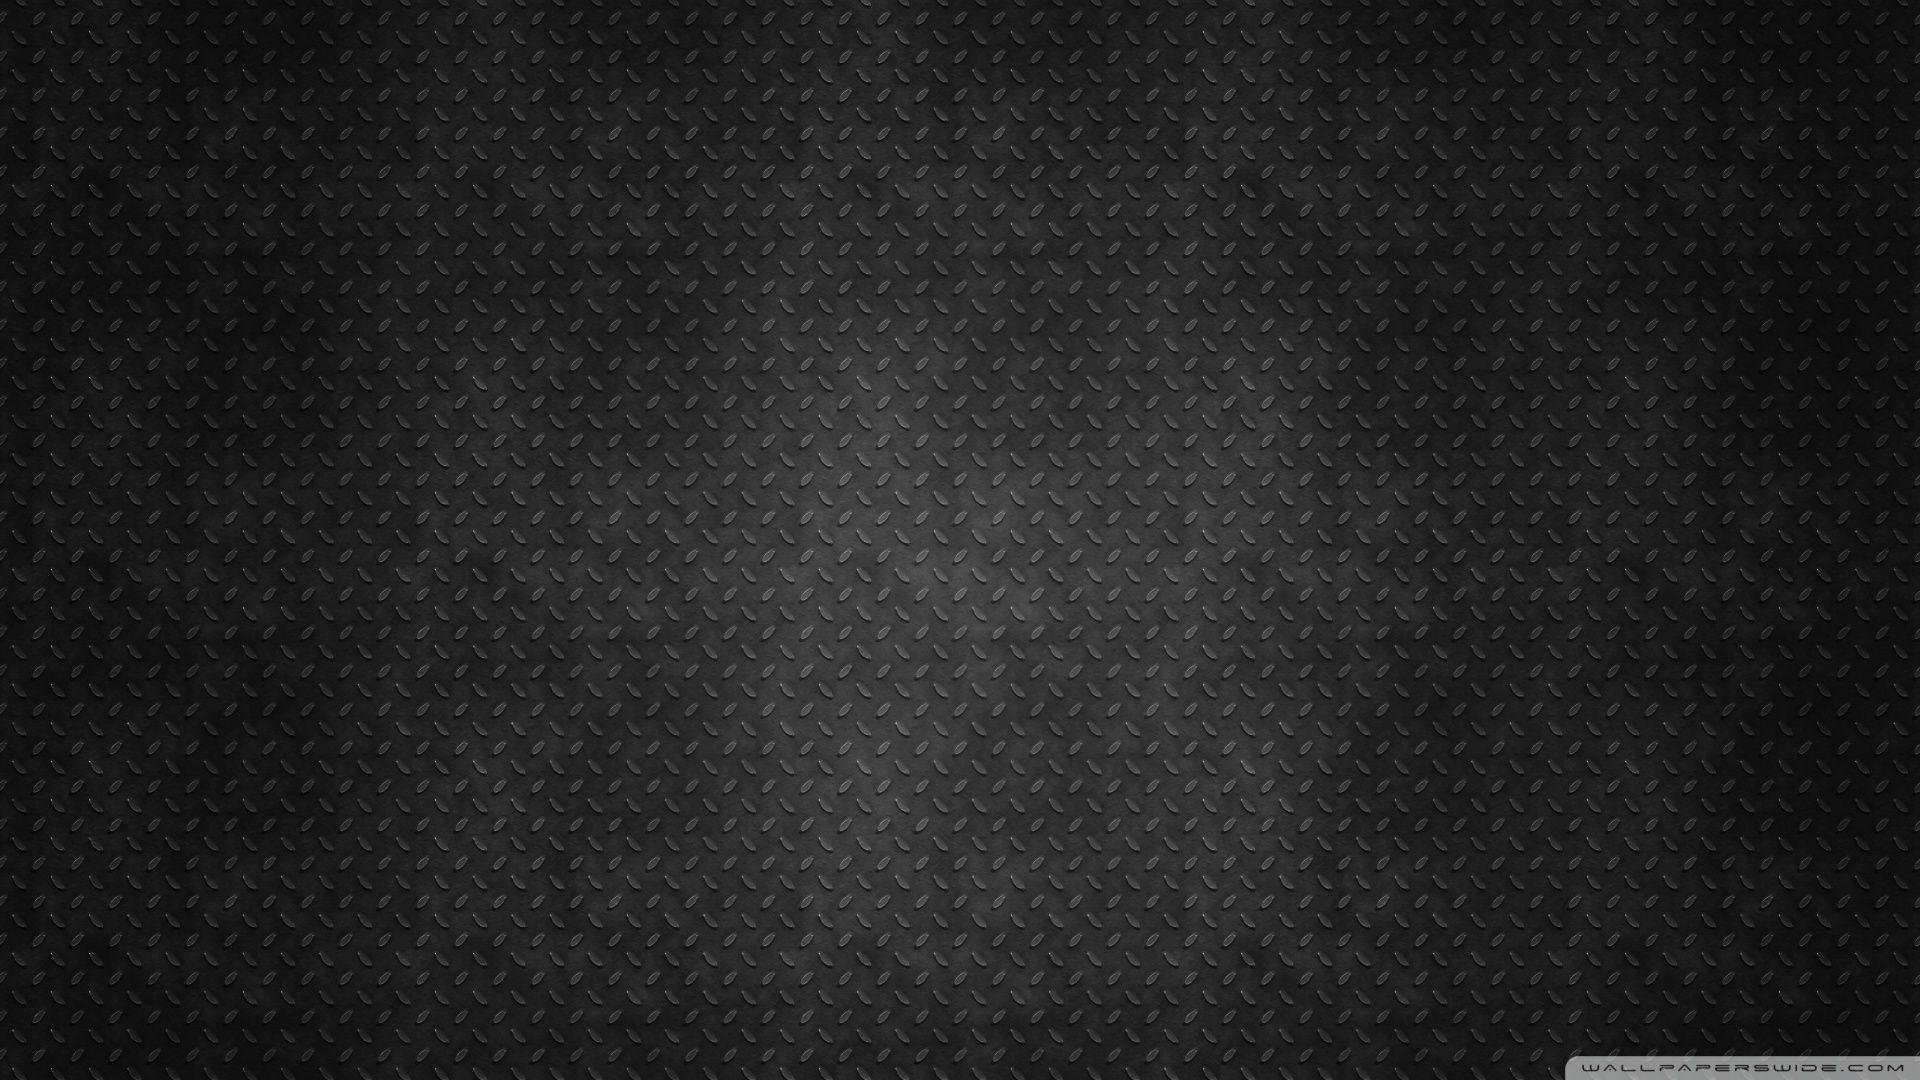 Black Background Cool Best Wallpaper Hd Black Wallpaper Pure Black Wallpaper Metal Texture